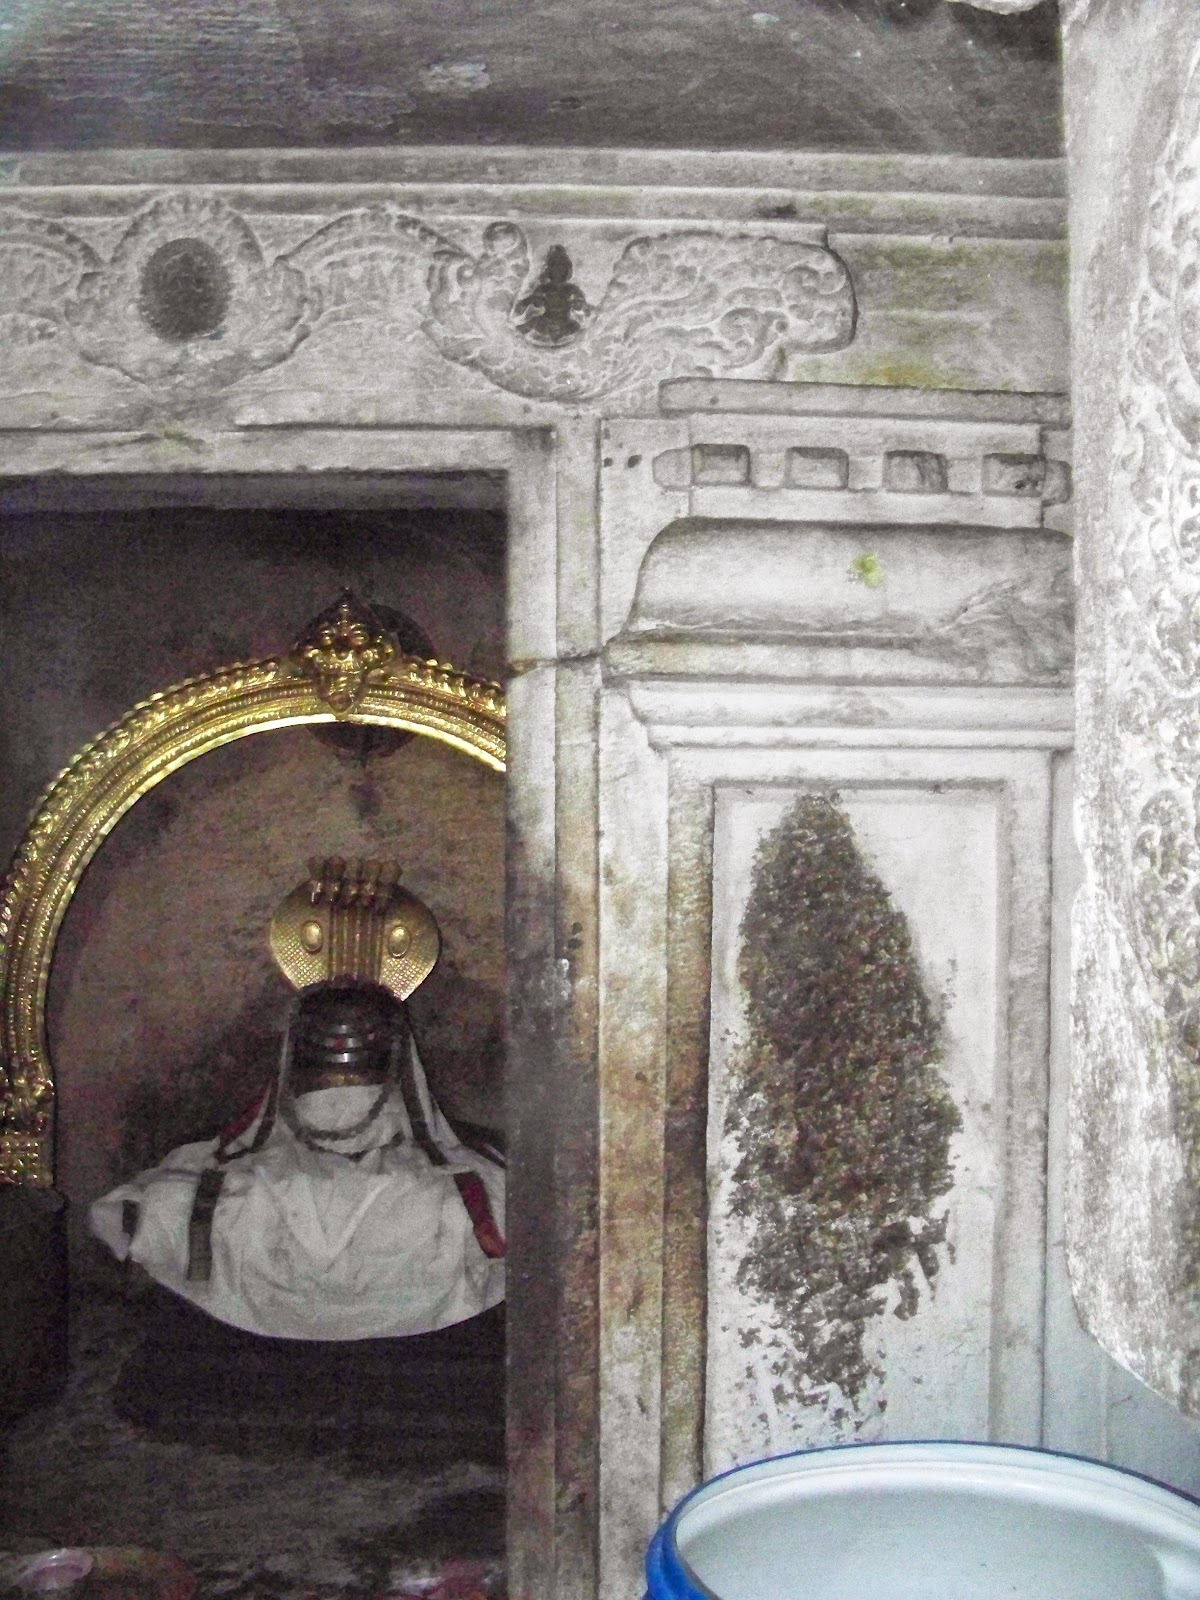 sanctum niche fig erased adi nag sleeping porch